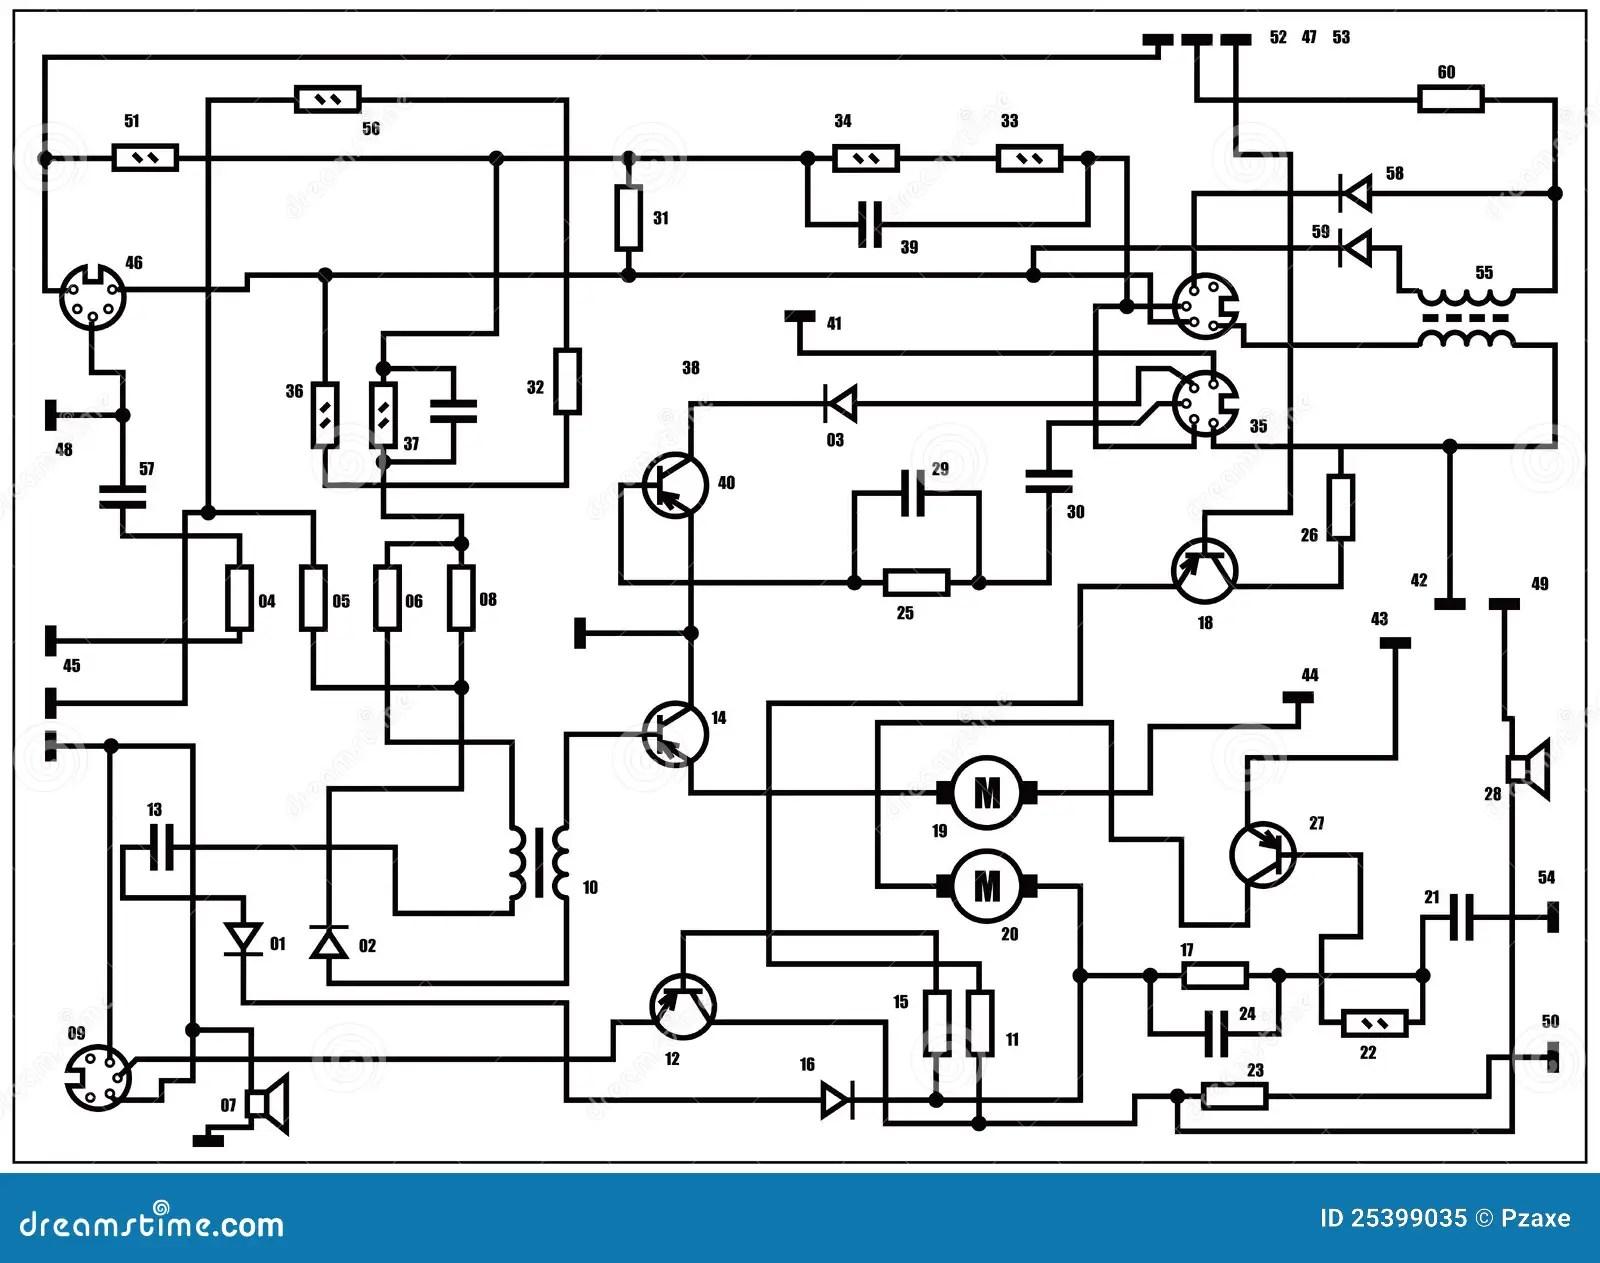 Electric Scheme